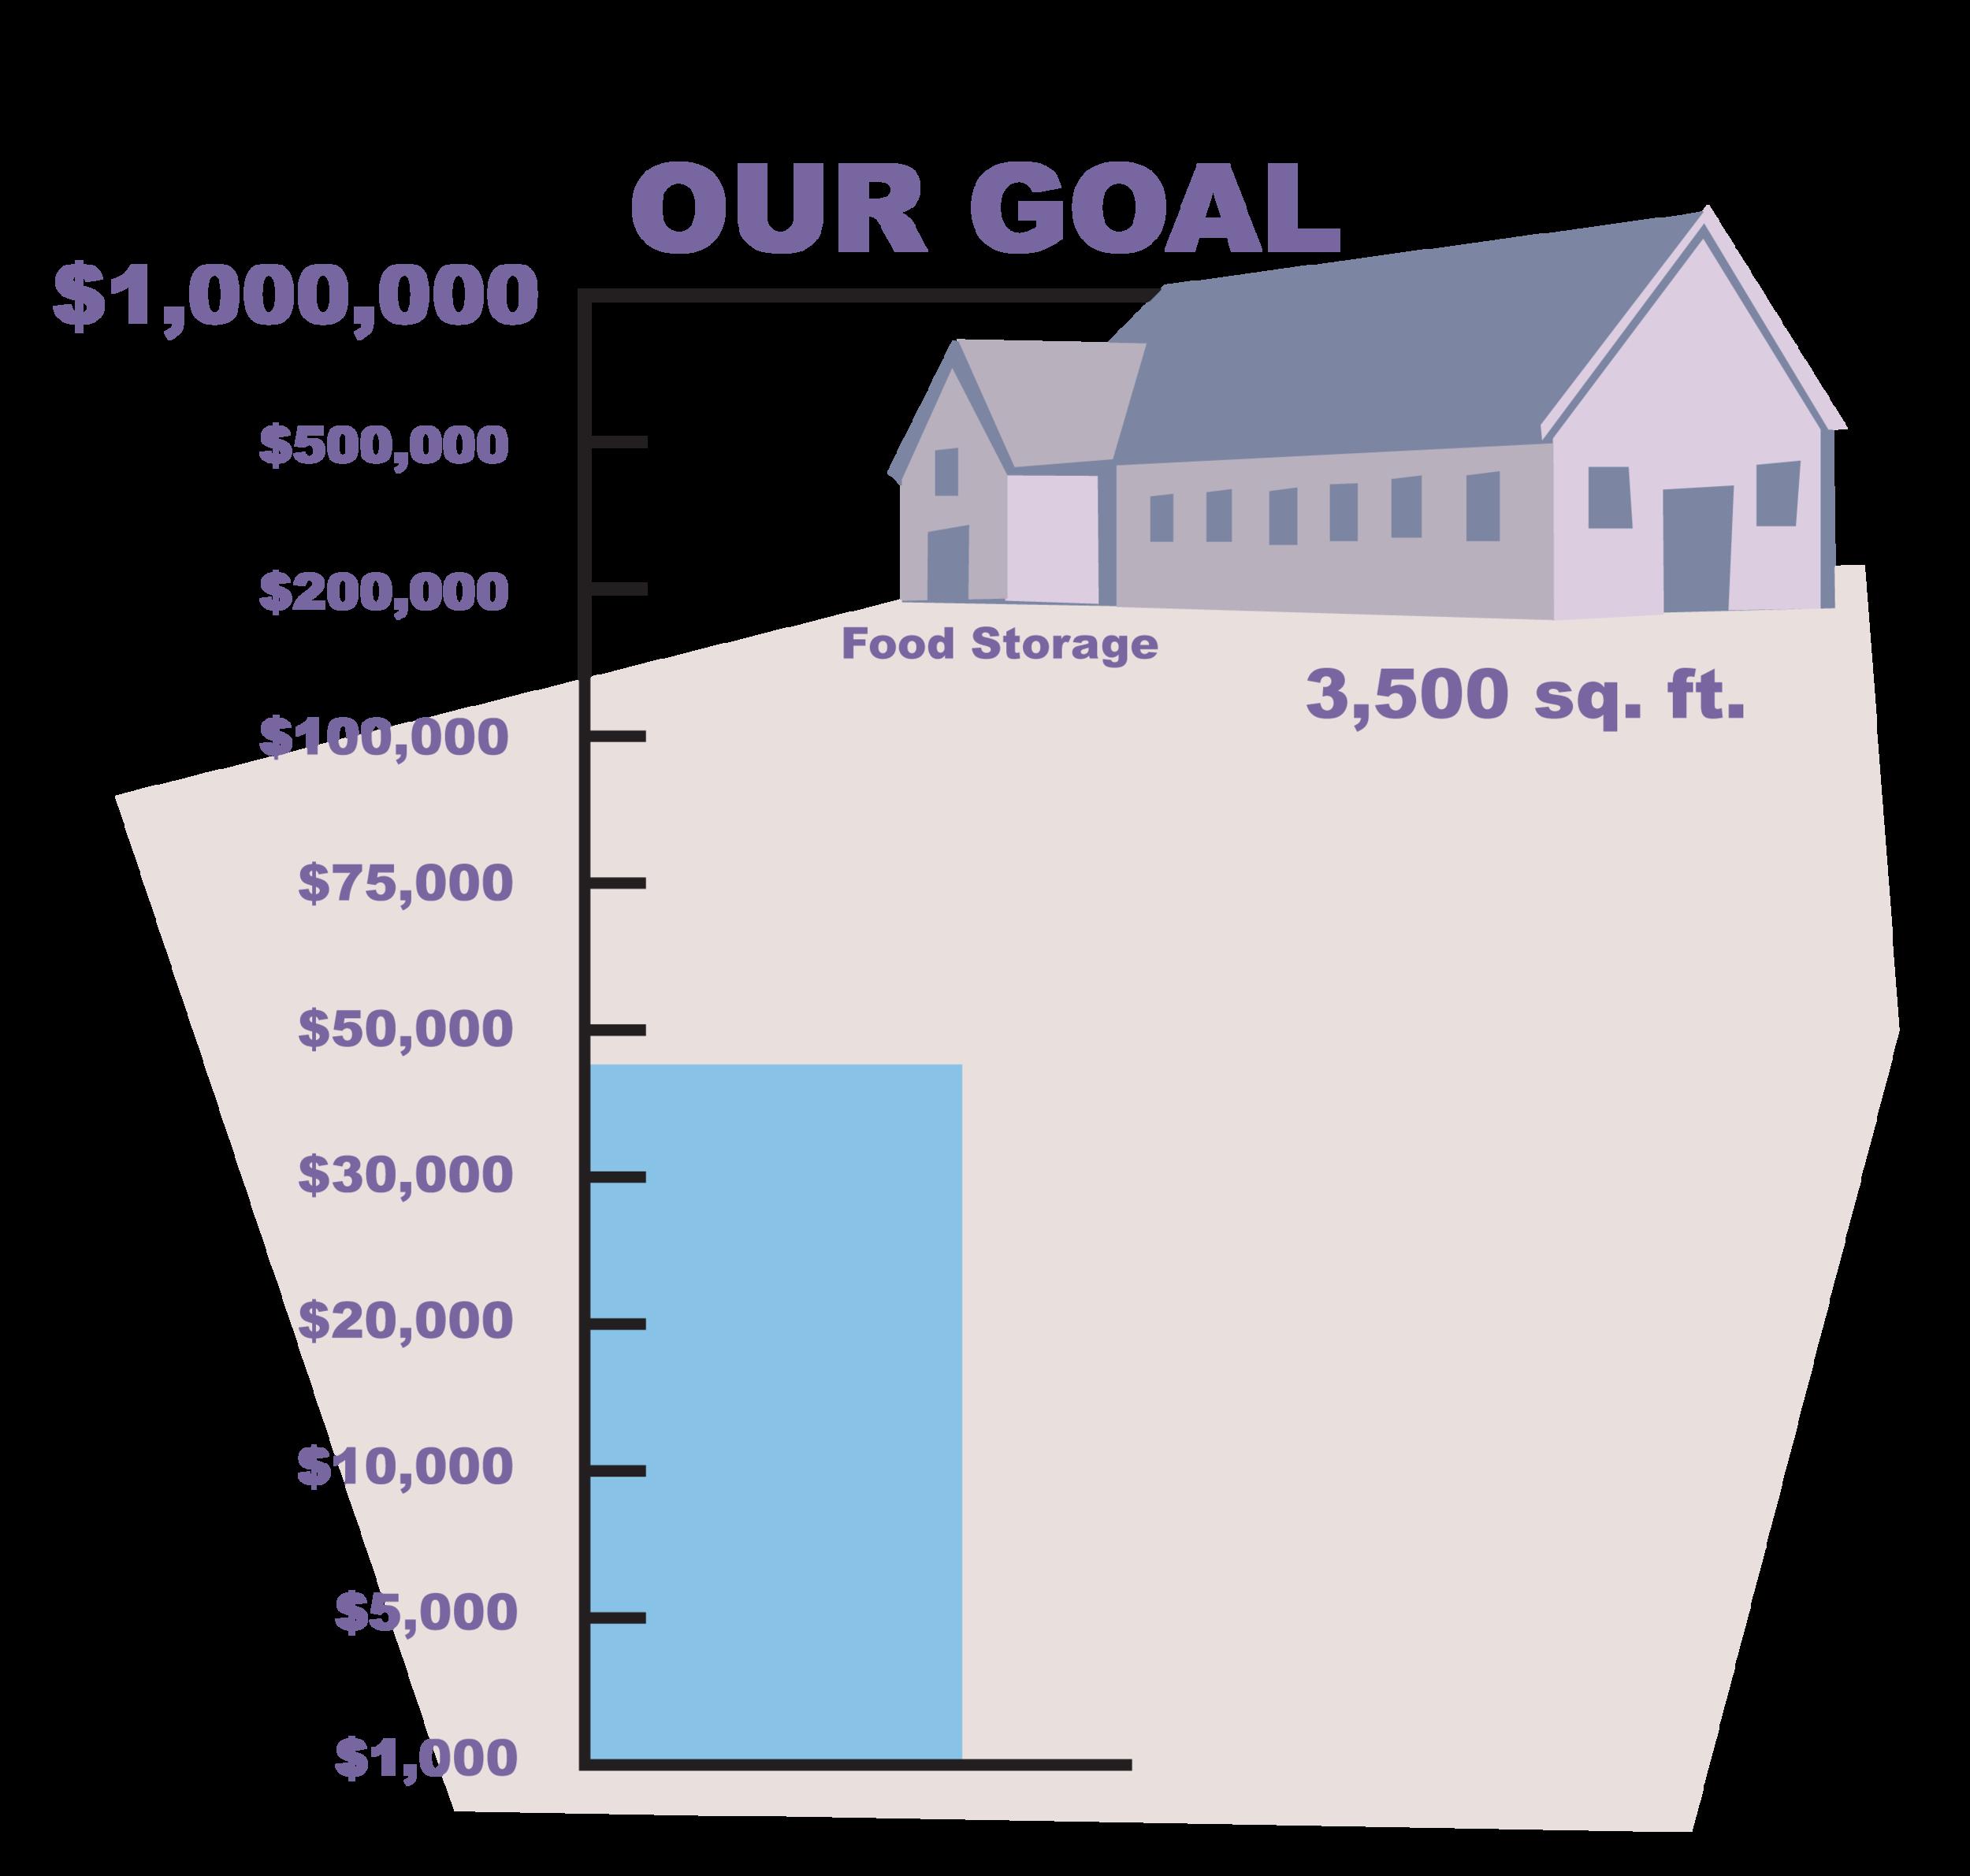 building-Fund-image.jpg